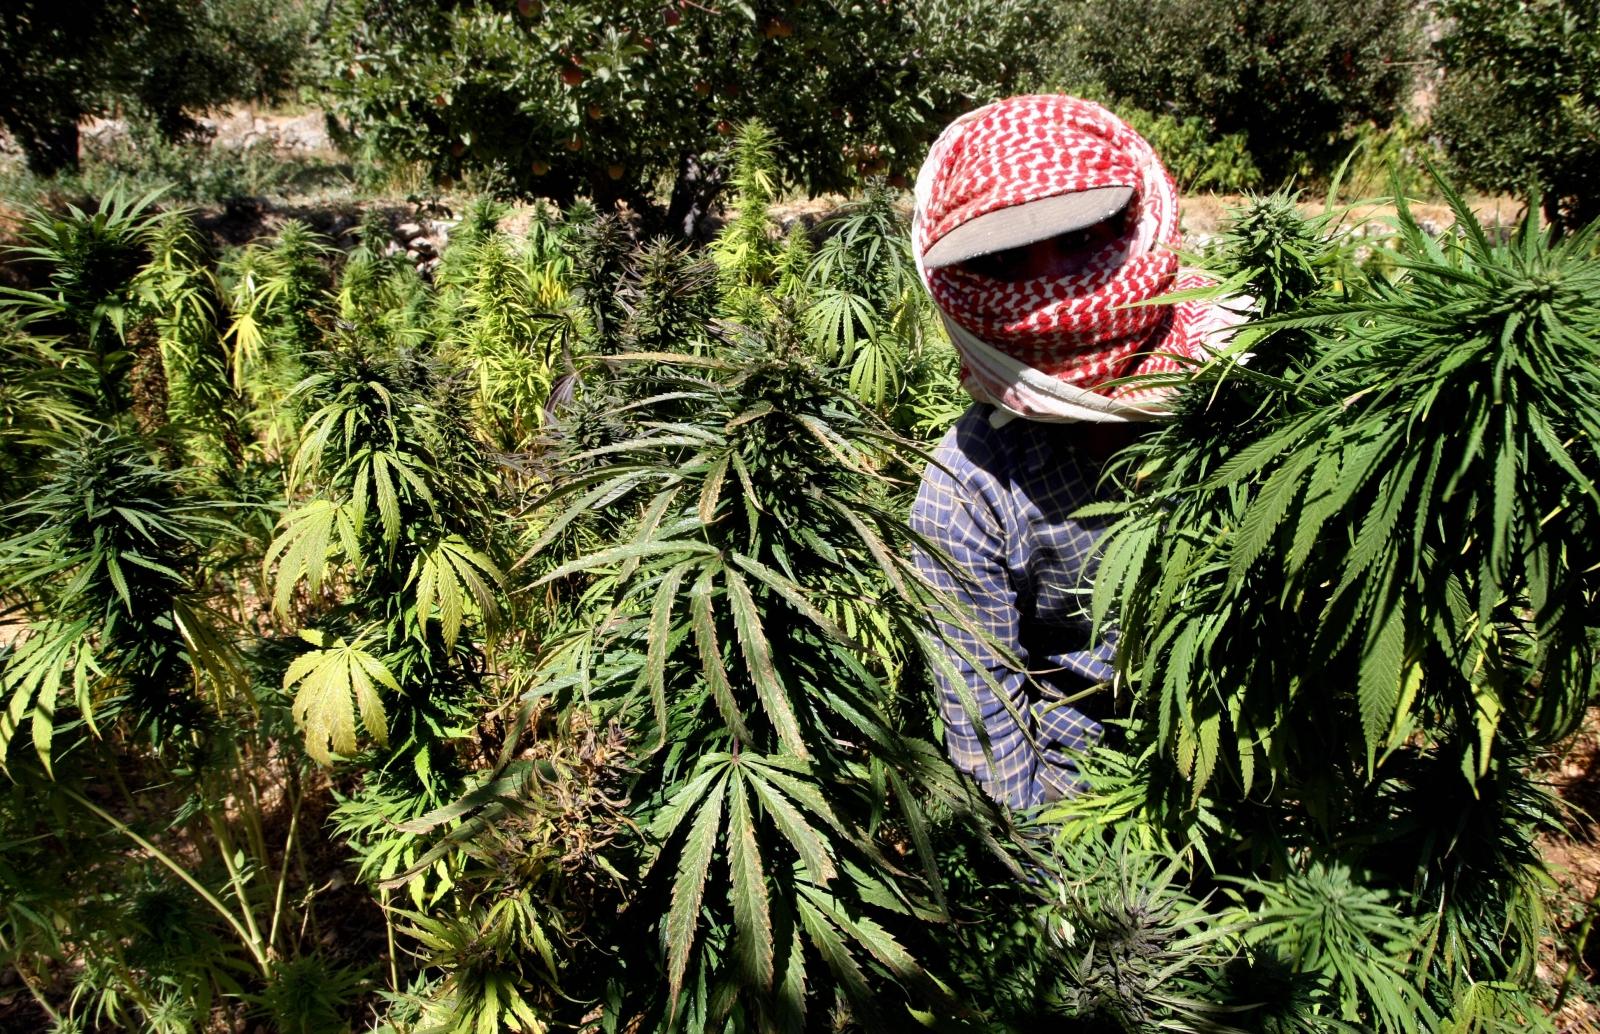 A marijuana farmer in Lebanon's Bekaa valley. (RAMZI HAIDAR/AFP/Getty Images)